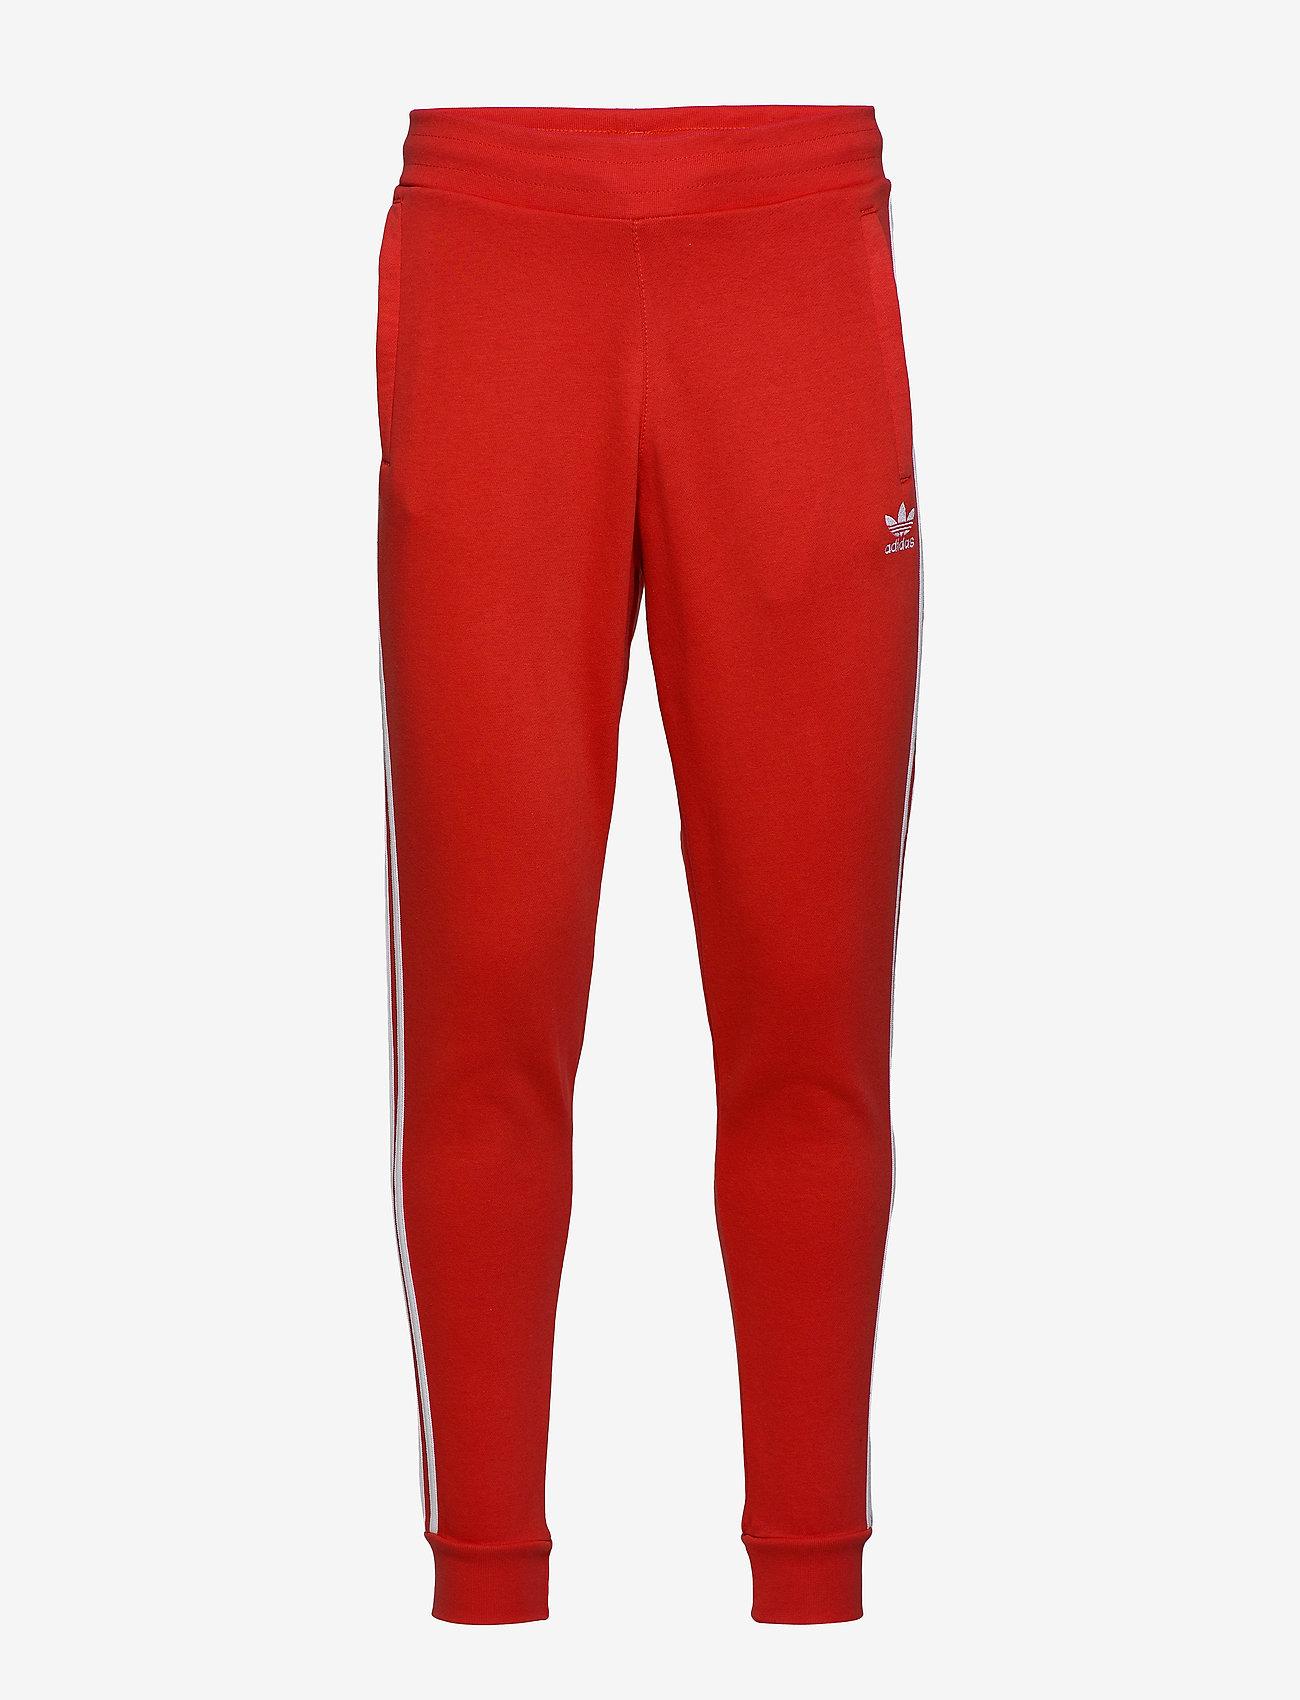 adidas Originals - 3-STRIPES PANT - pants - lusred - 1